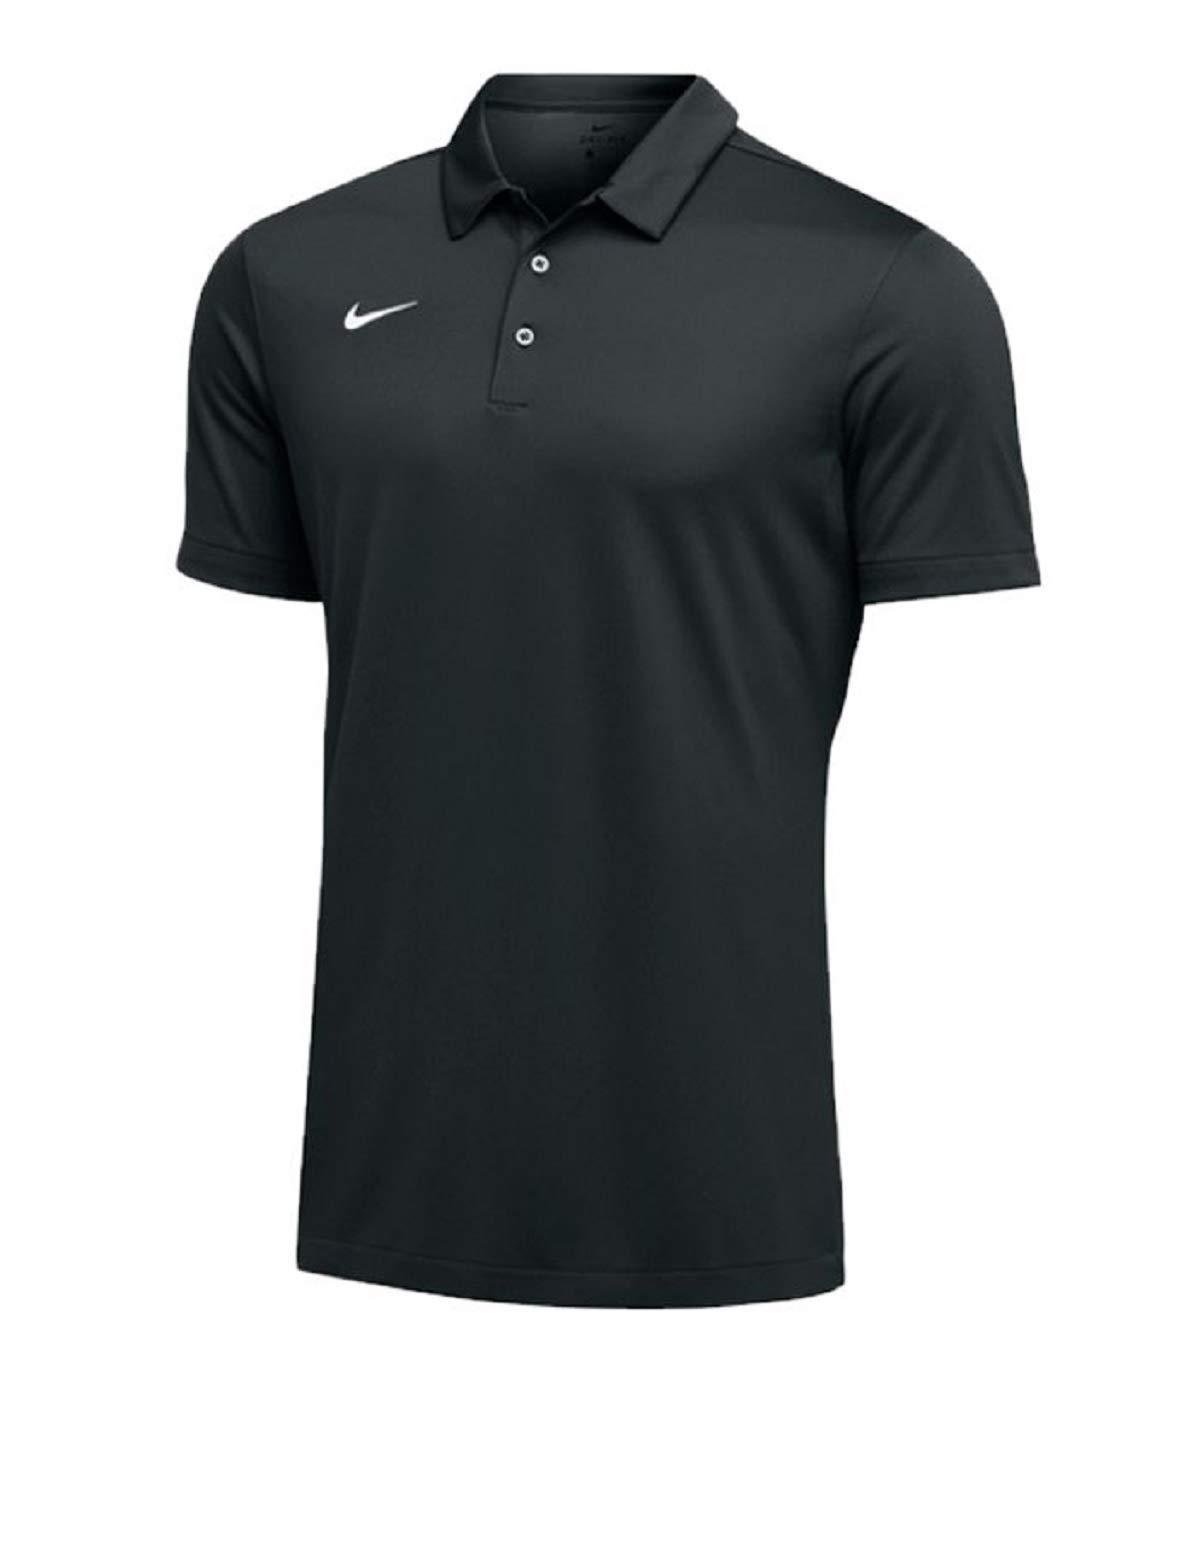 Nike Mens Dri-FIT Short Sleeve Polo Shirt (Small, Black)